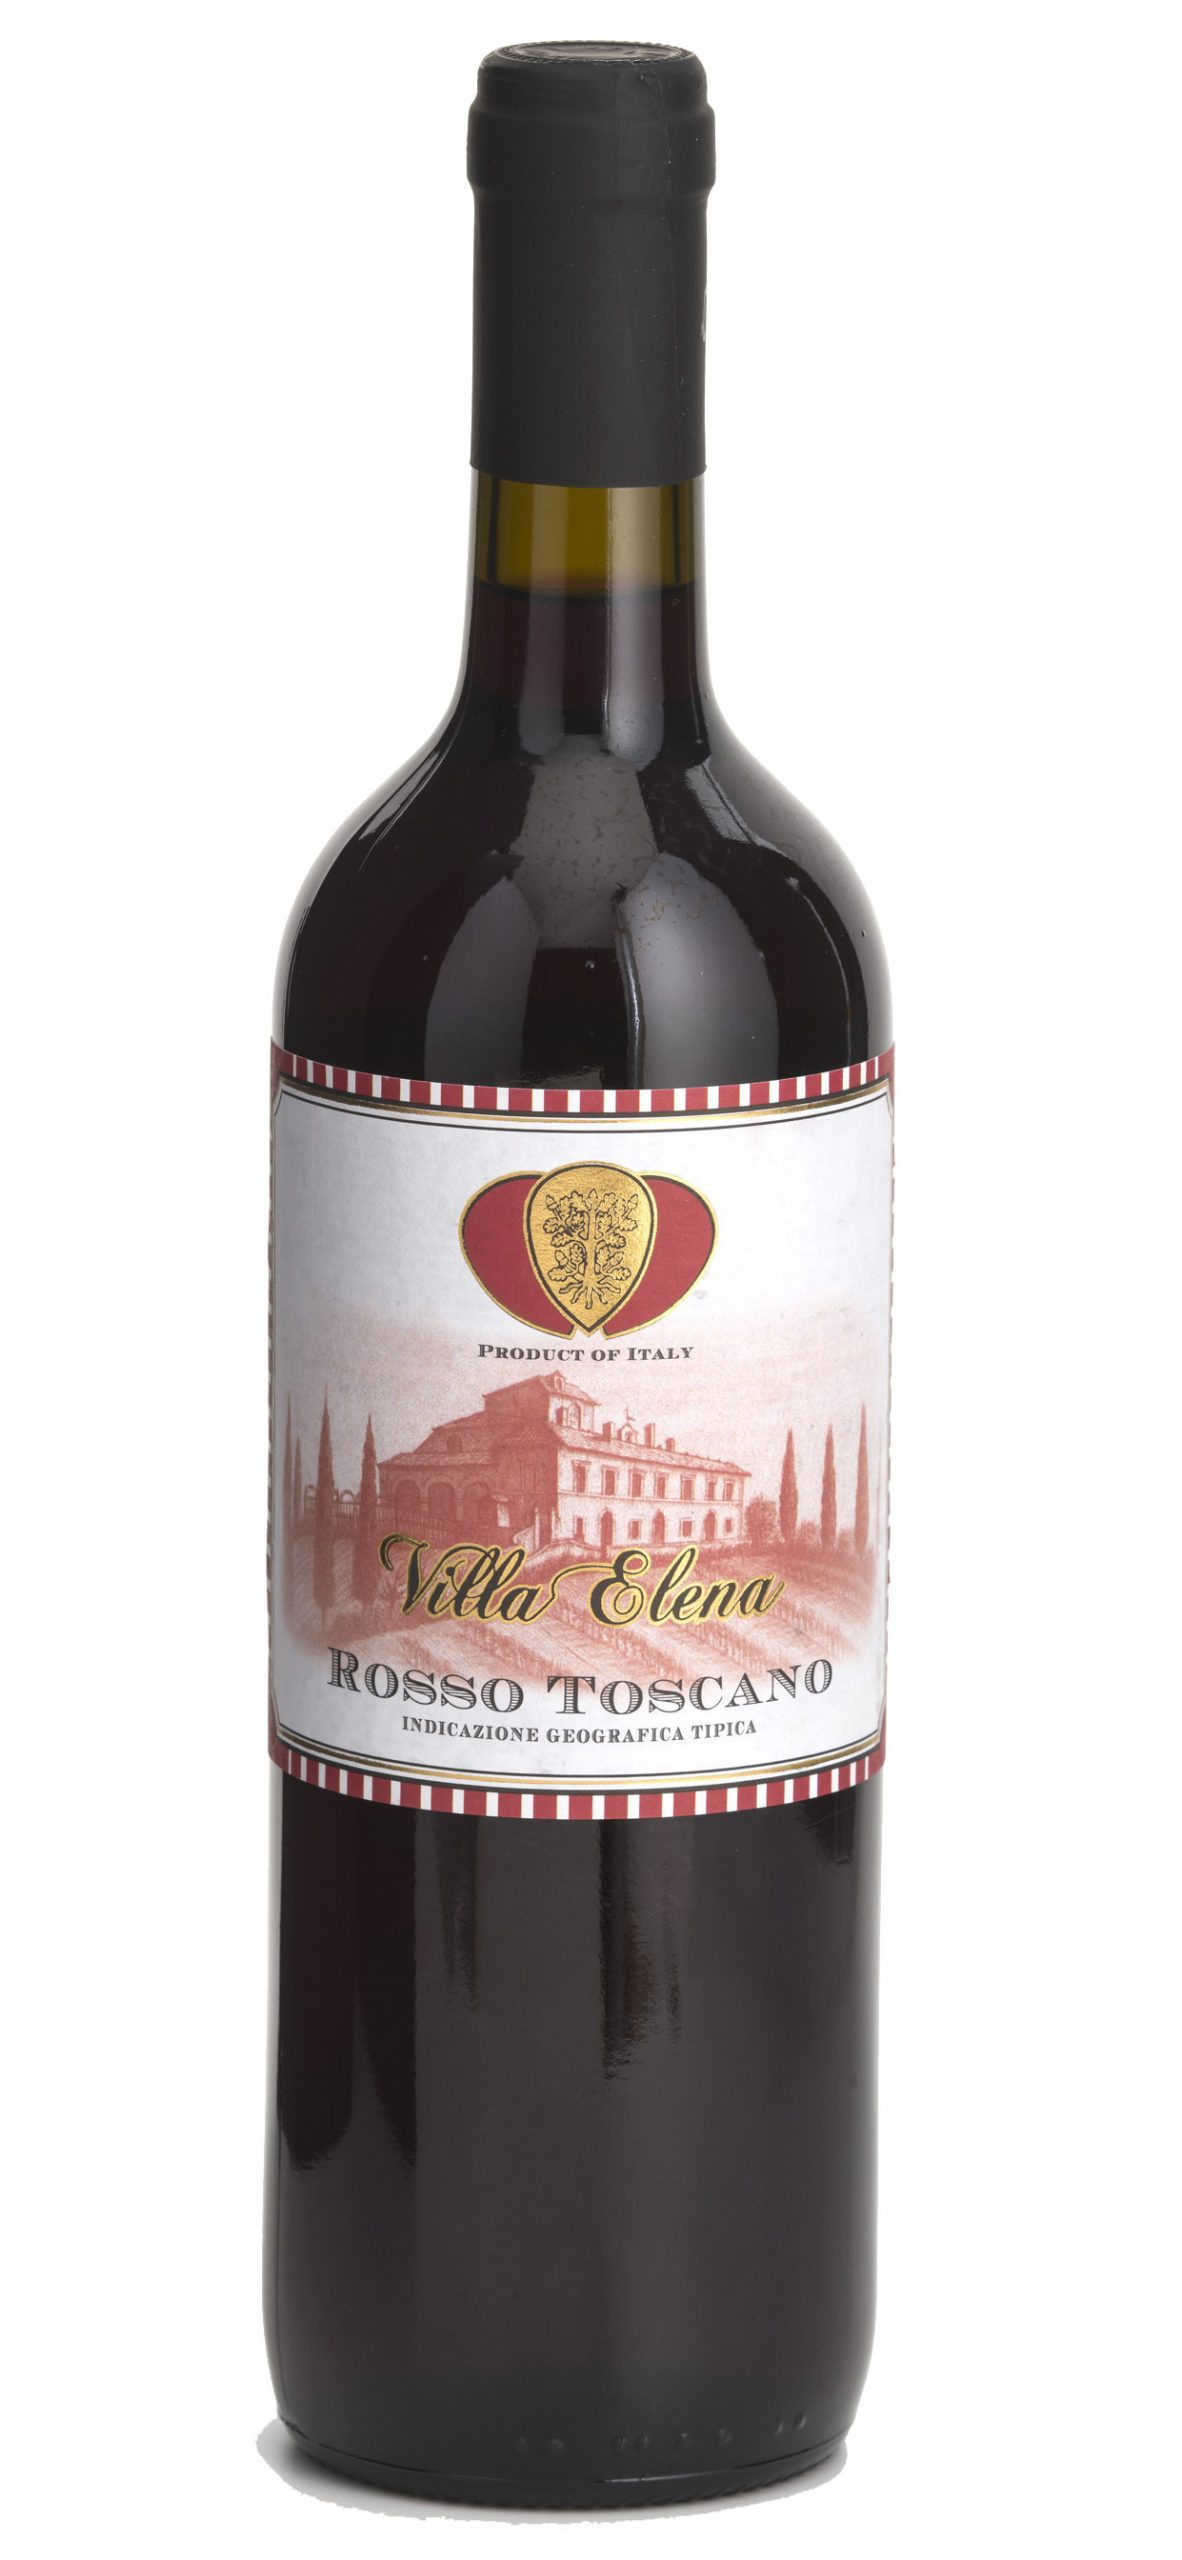 Toscano Rosso Villa Elena